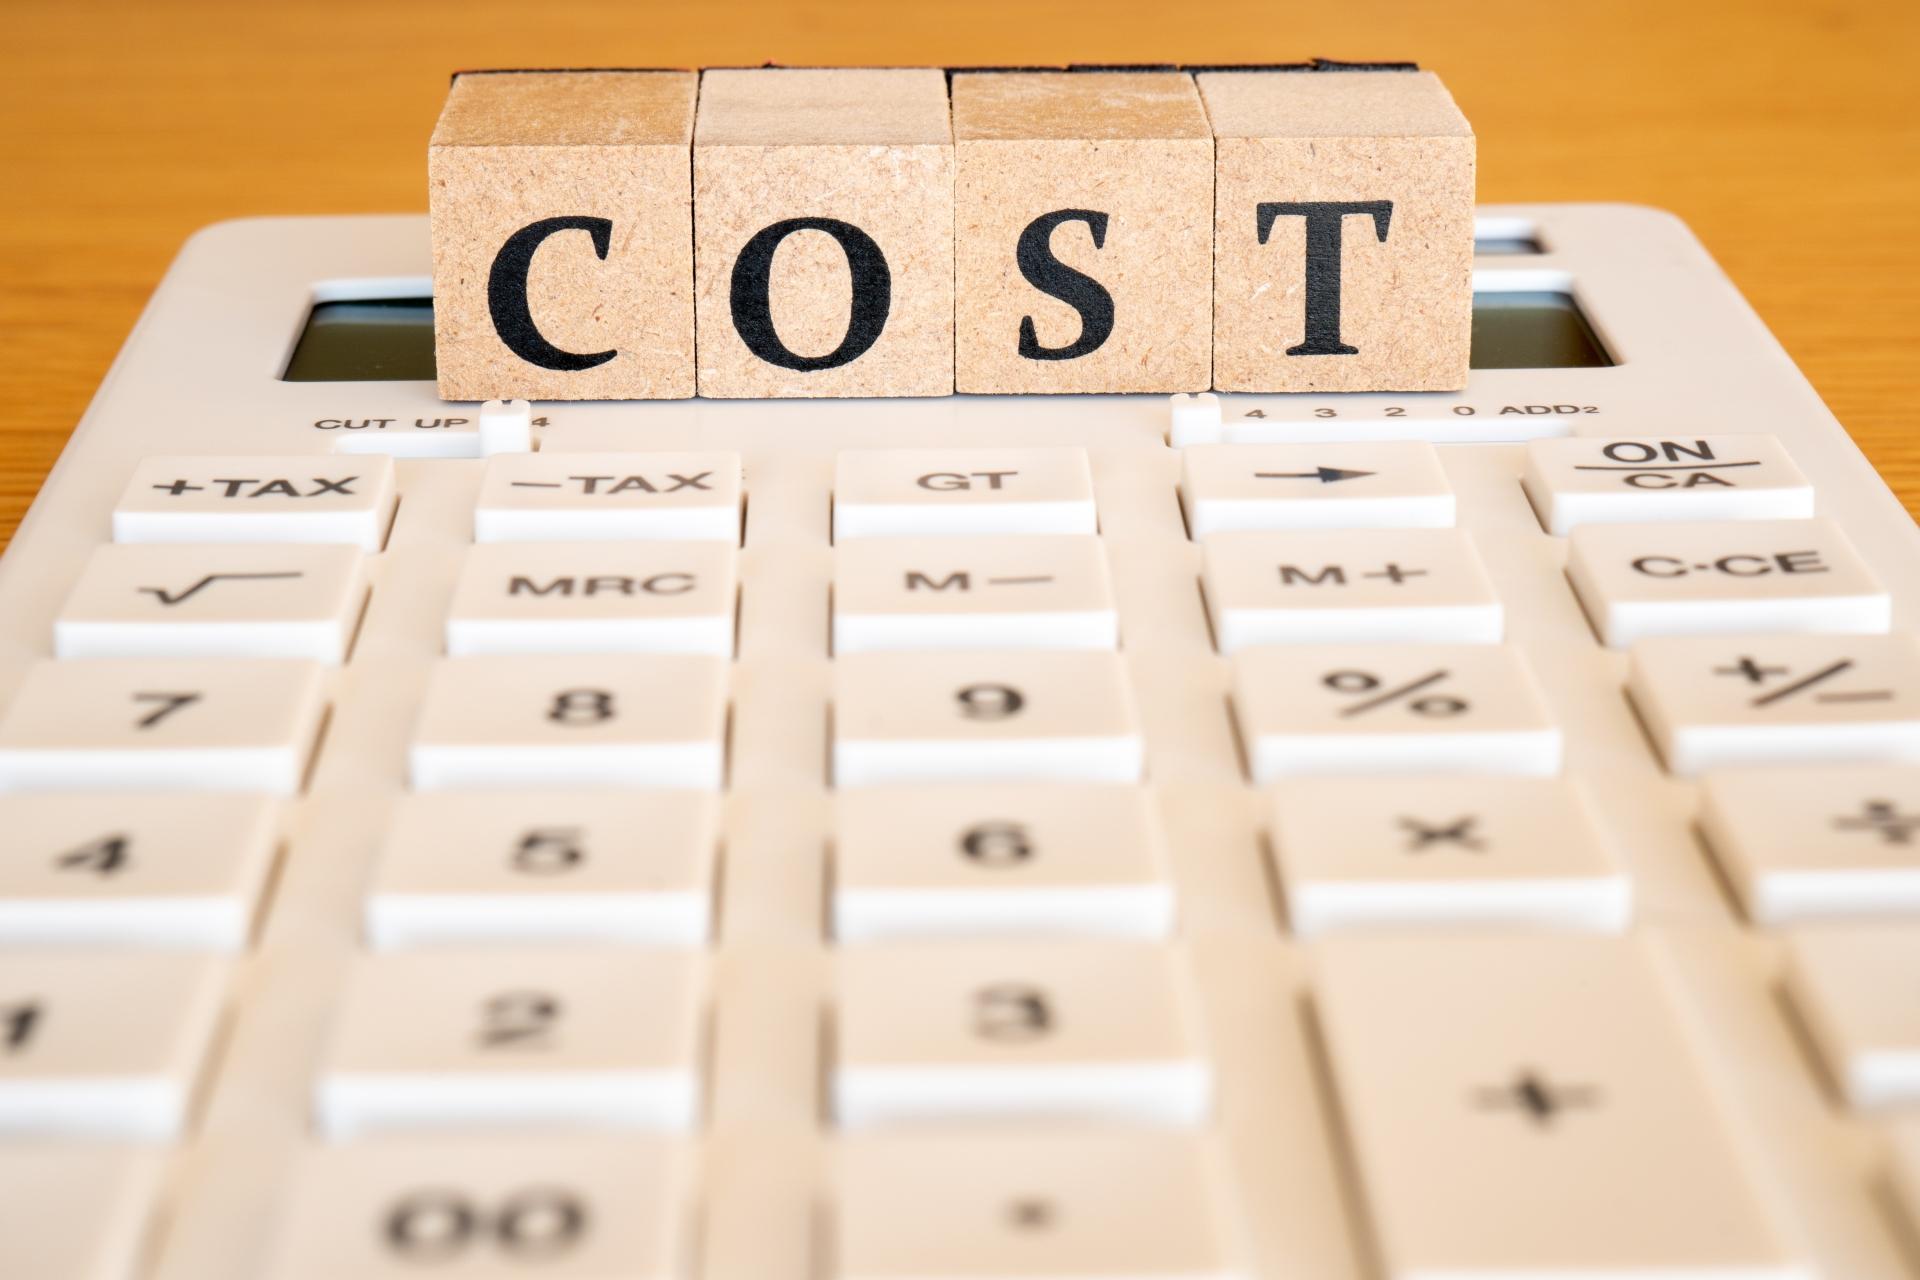 COST表示の電卓